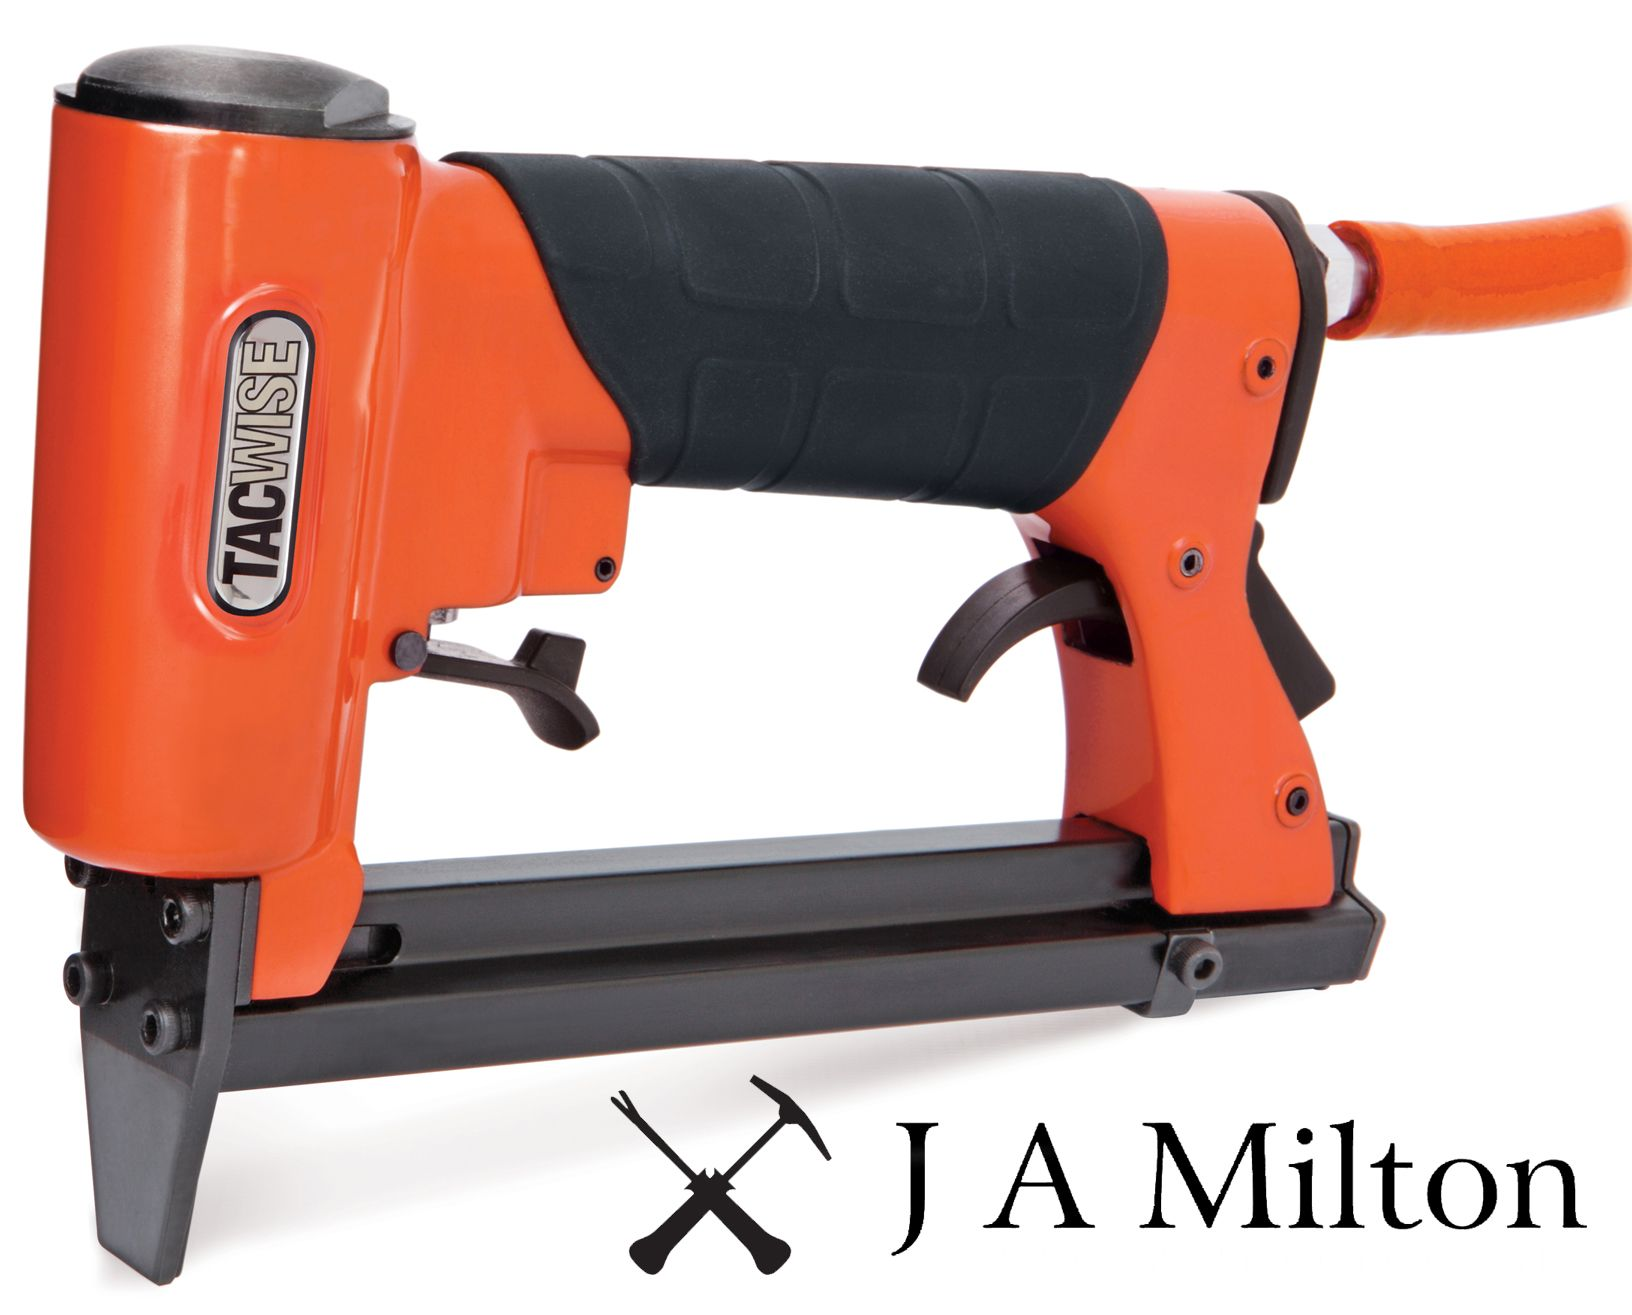 J A Milton Sell The Rapesco 71 Series Pneumatic Staple Gun It Has A